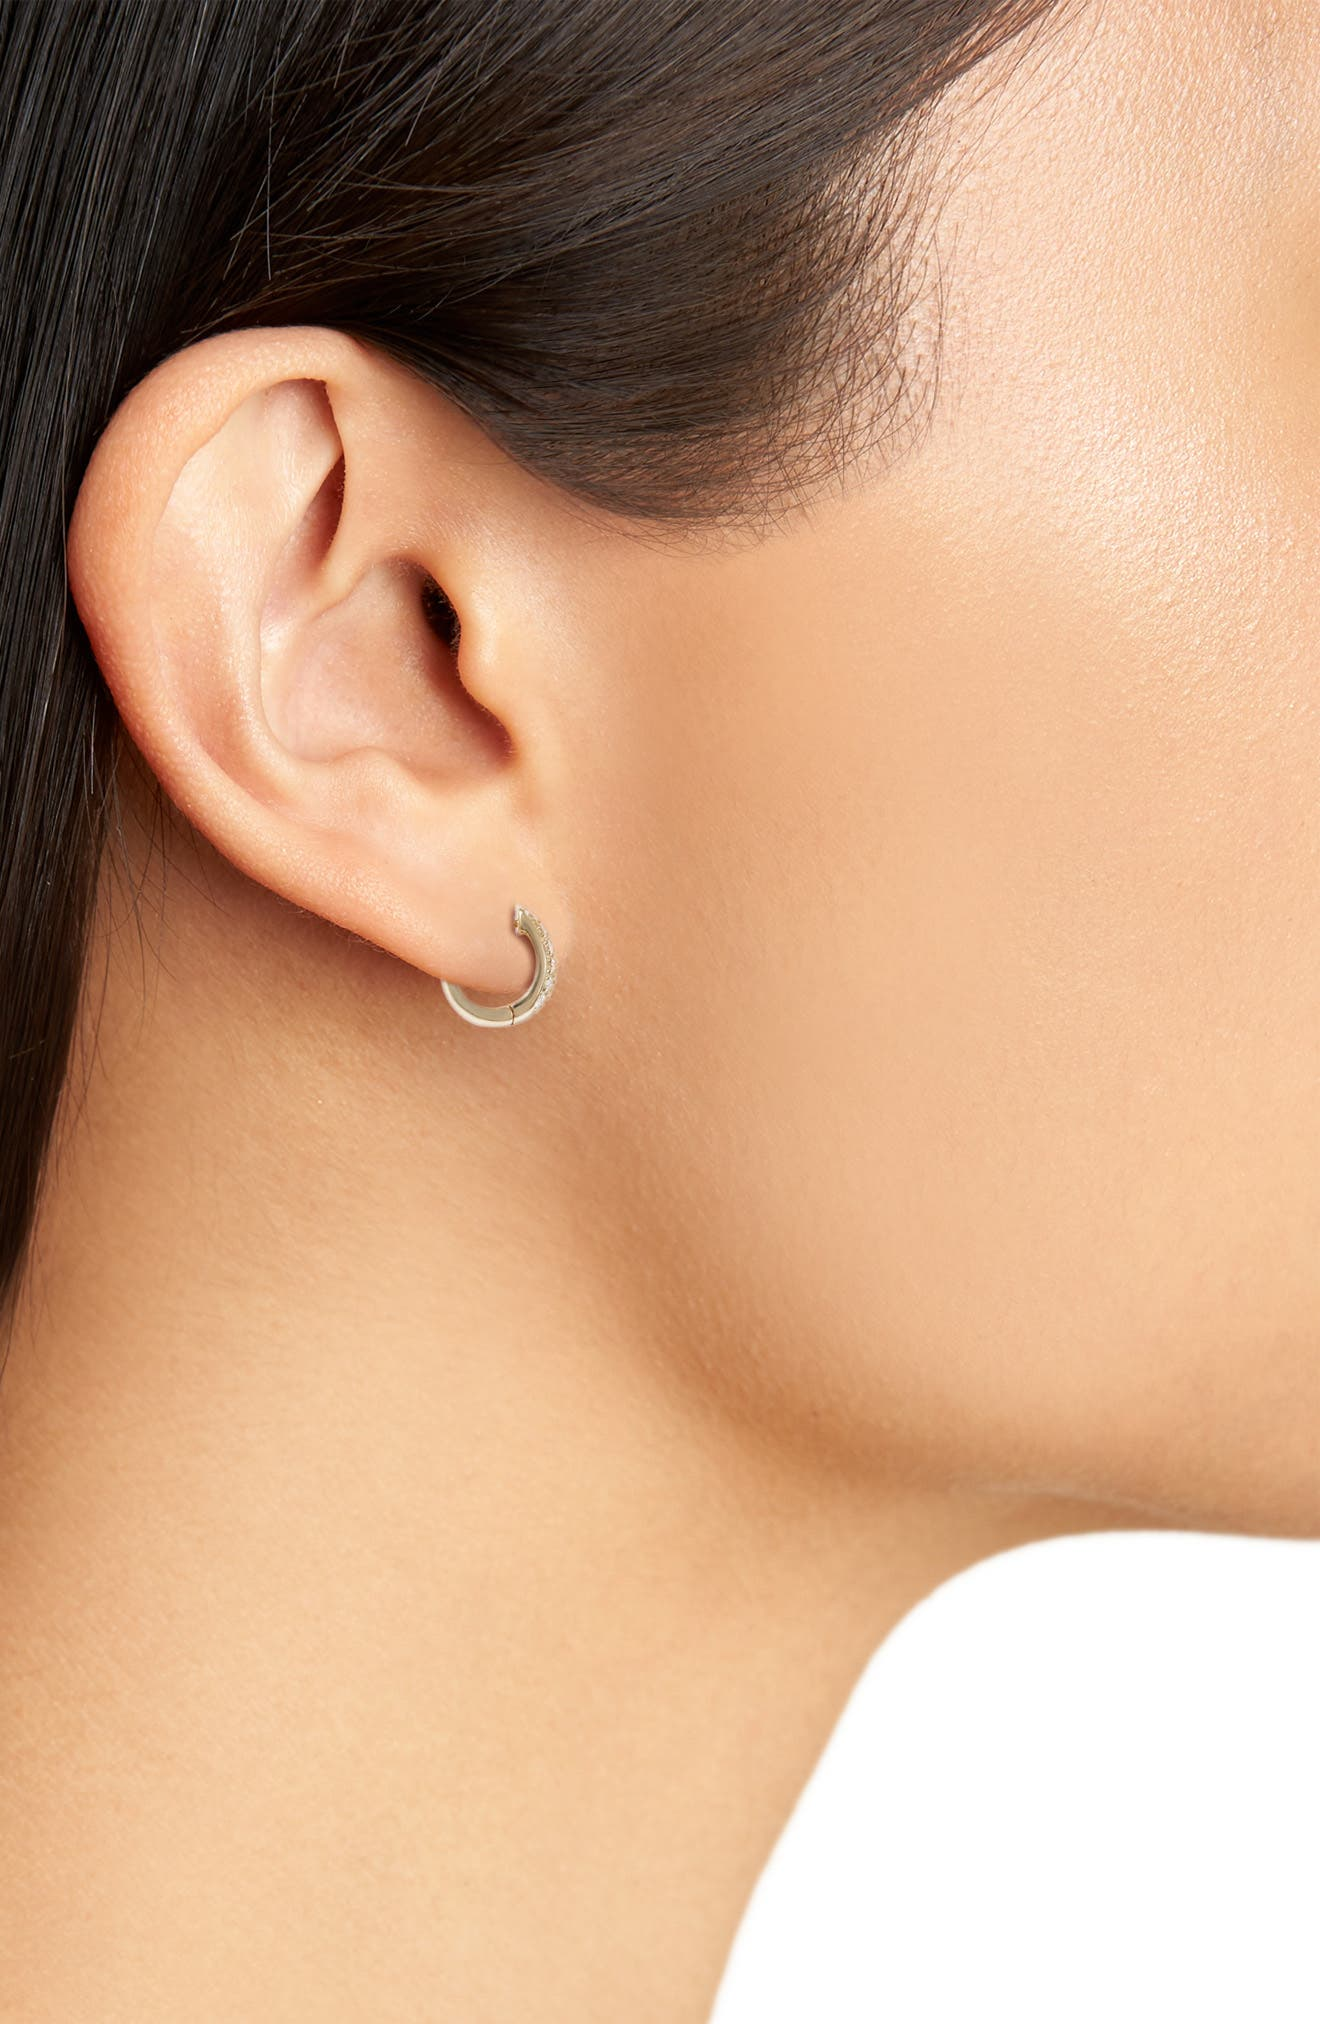 Dana Rebecca Mini Diamond Hoop Earrings,                             Alternate thumbnail 2, color,                             YELLOW GOLD